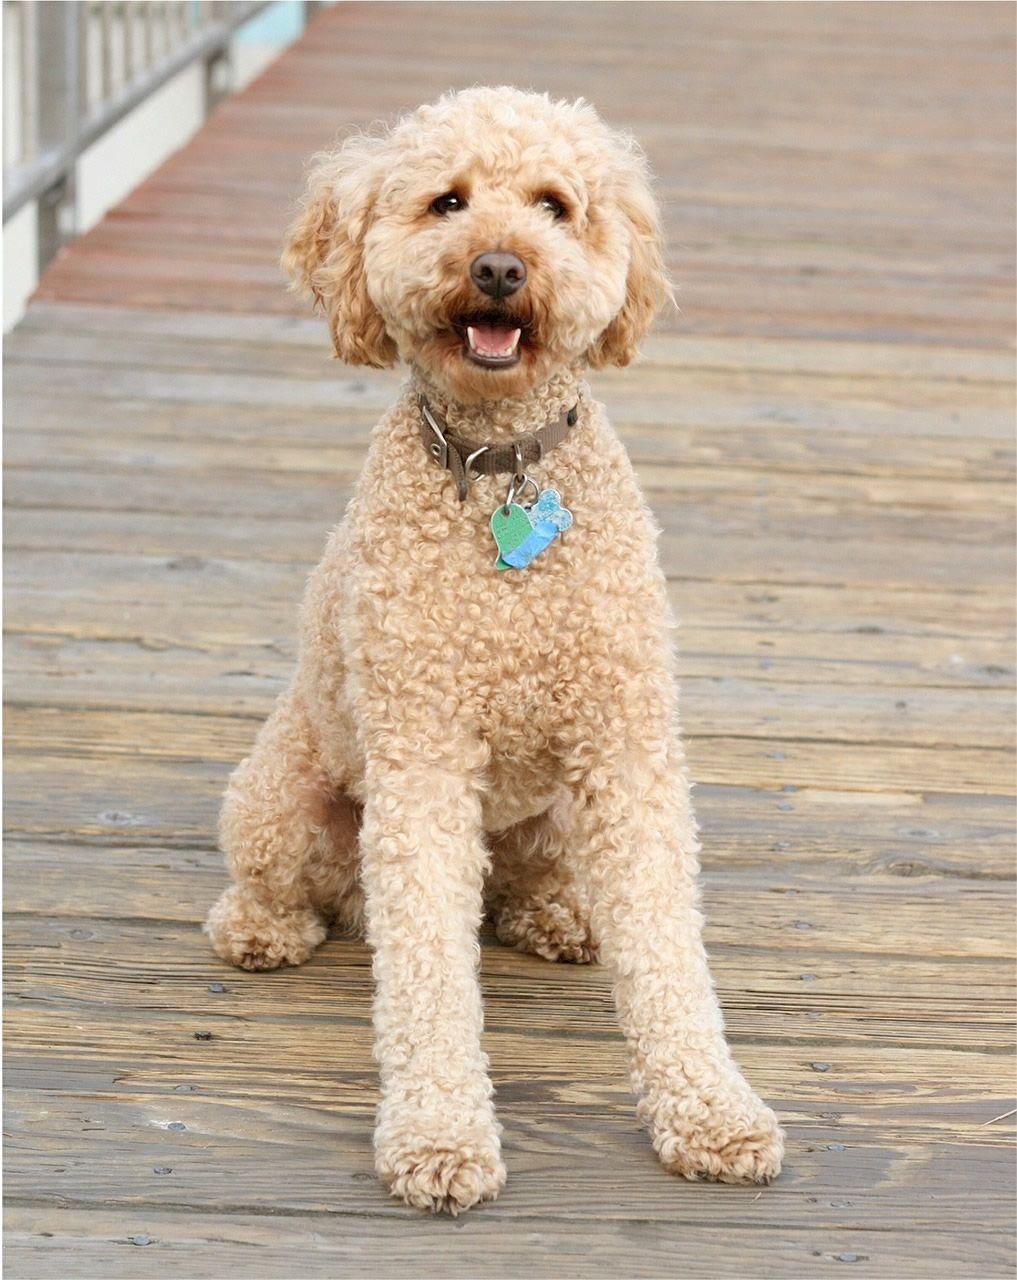 Labrador Poodle Mix Hypoallergenic Dog Breed Labradoodle Dogs